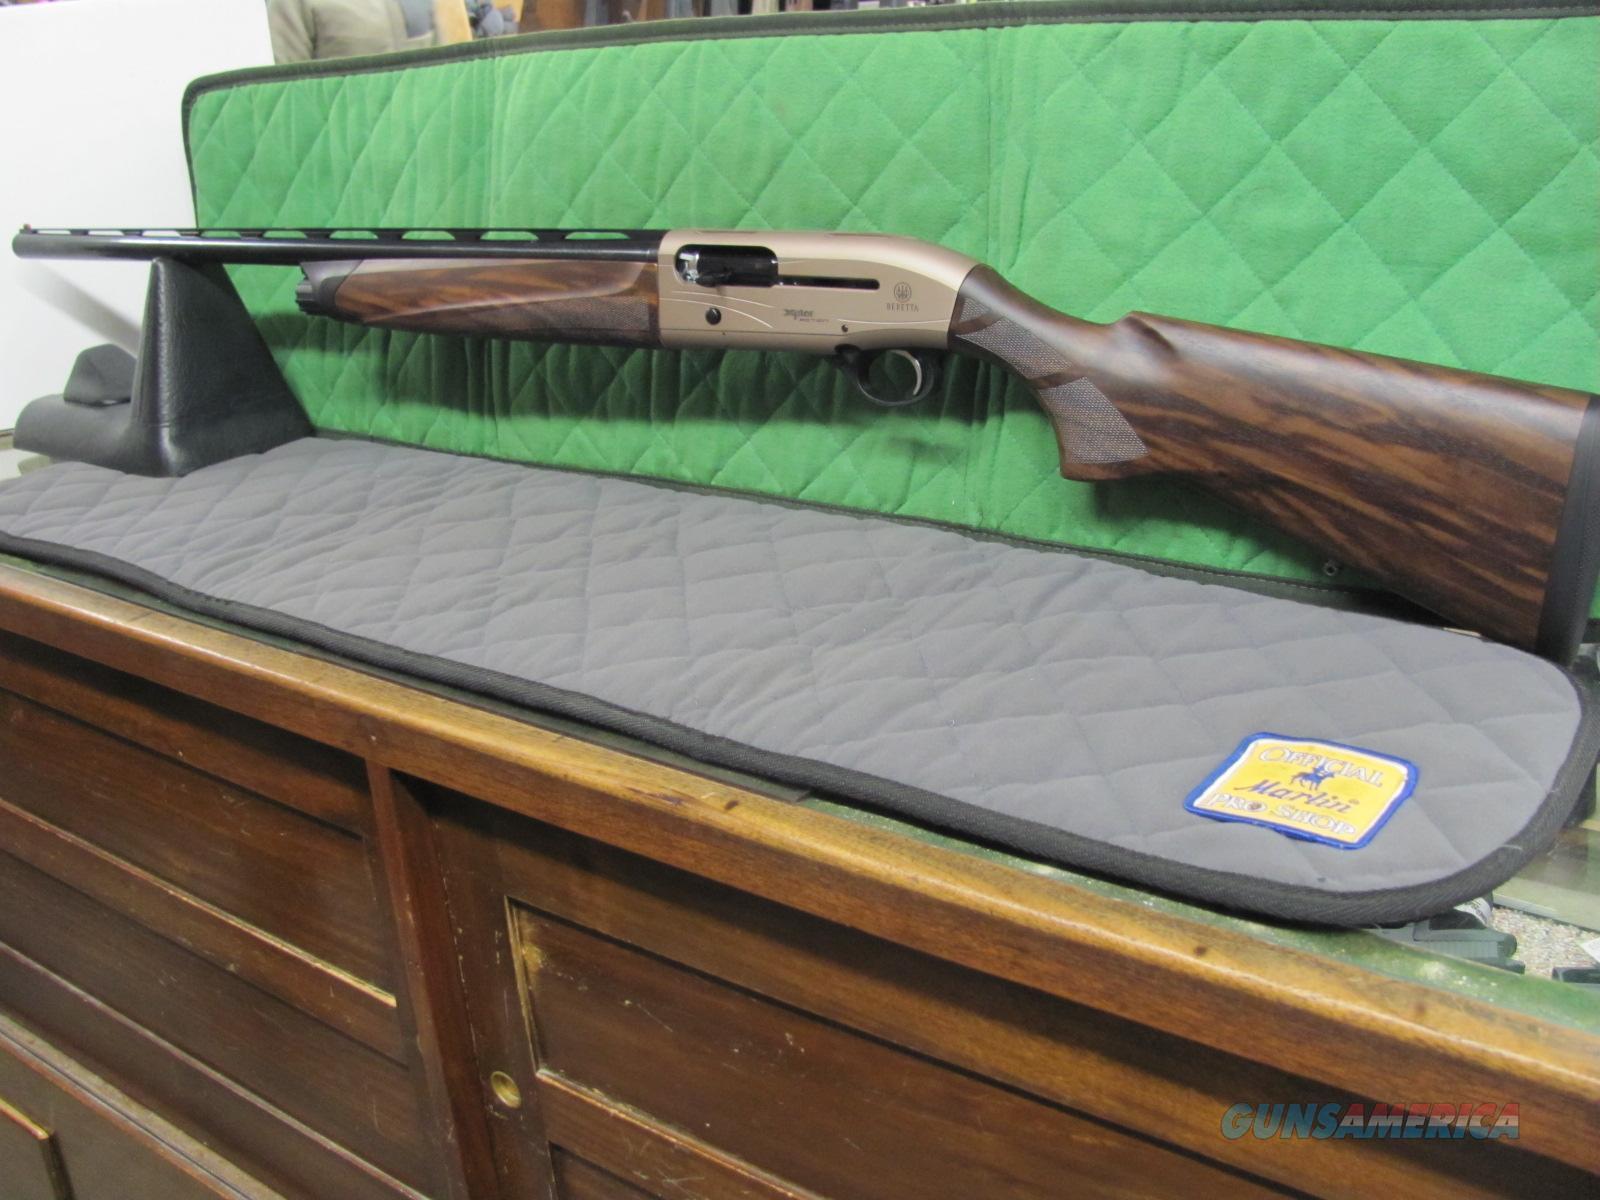 Beretta A400 Xplor Action Left Hand 28 Inch  **NEW**  Guns > Shotguns > Beretta Shotguns > Autoloaders > Hunting